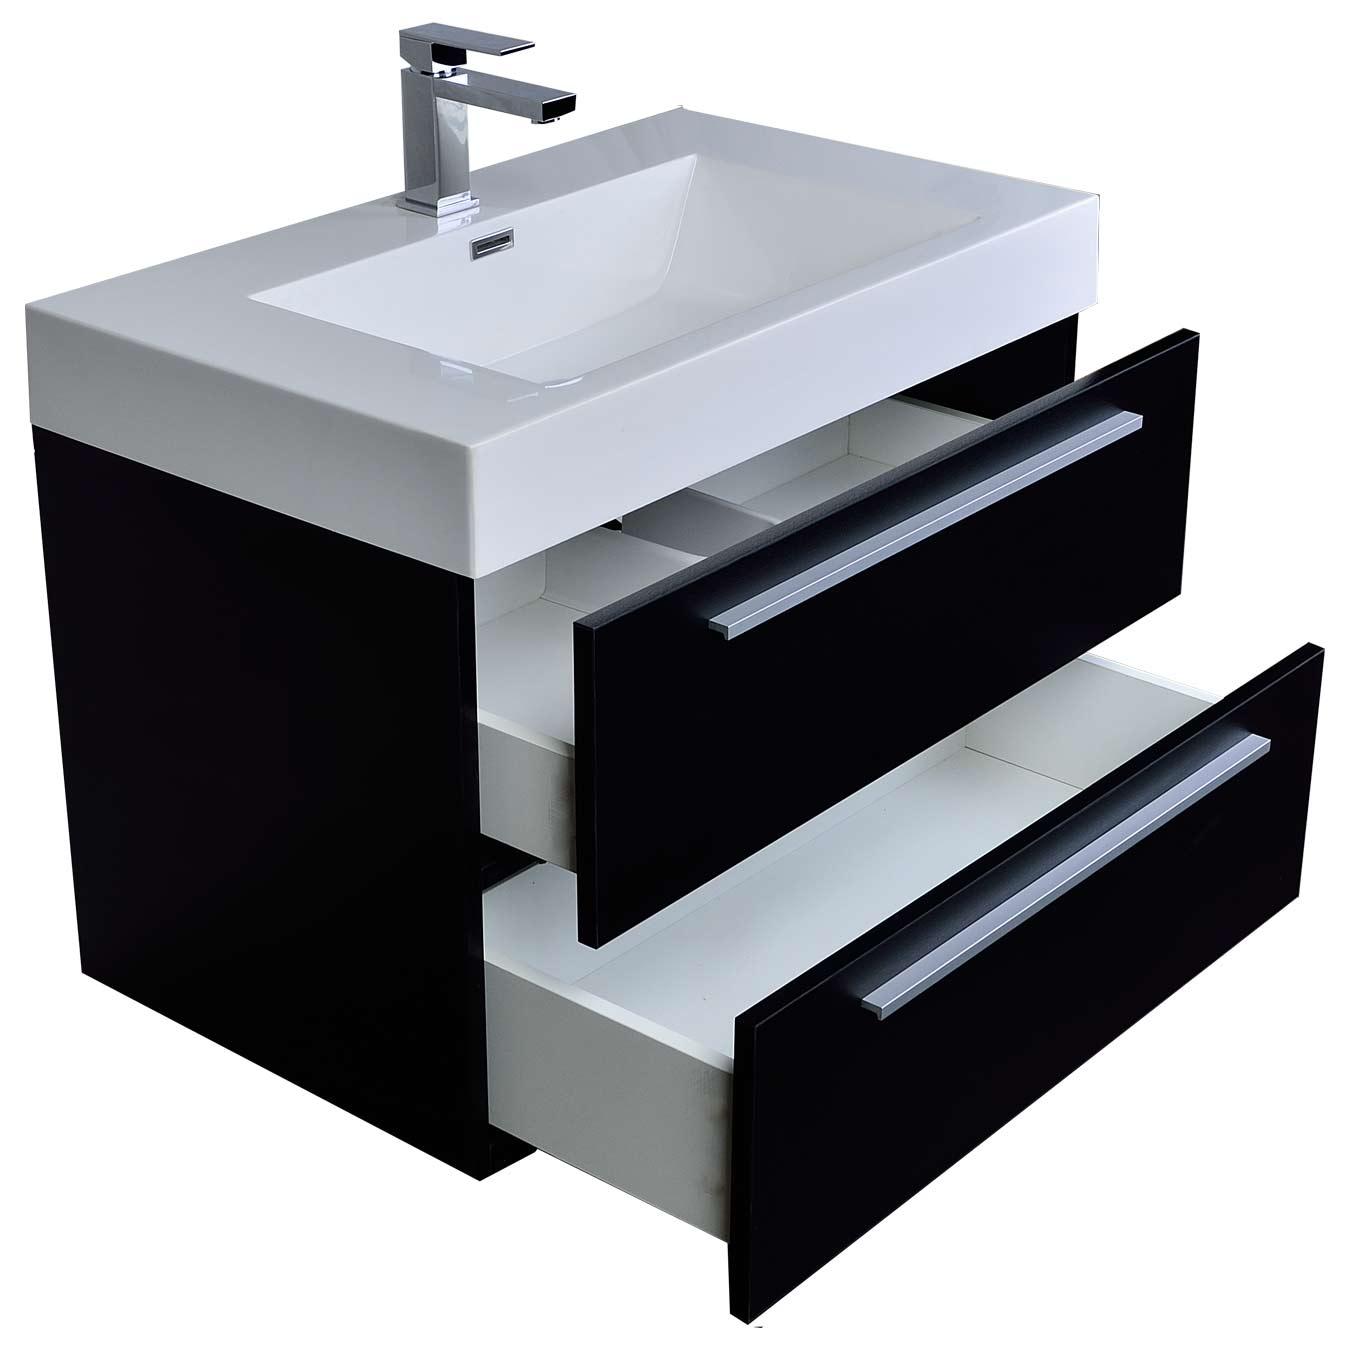 315 single bathroom vanity tn m800 bk